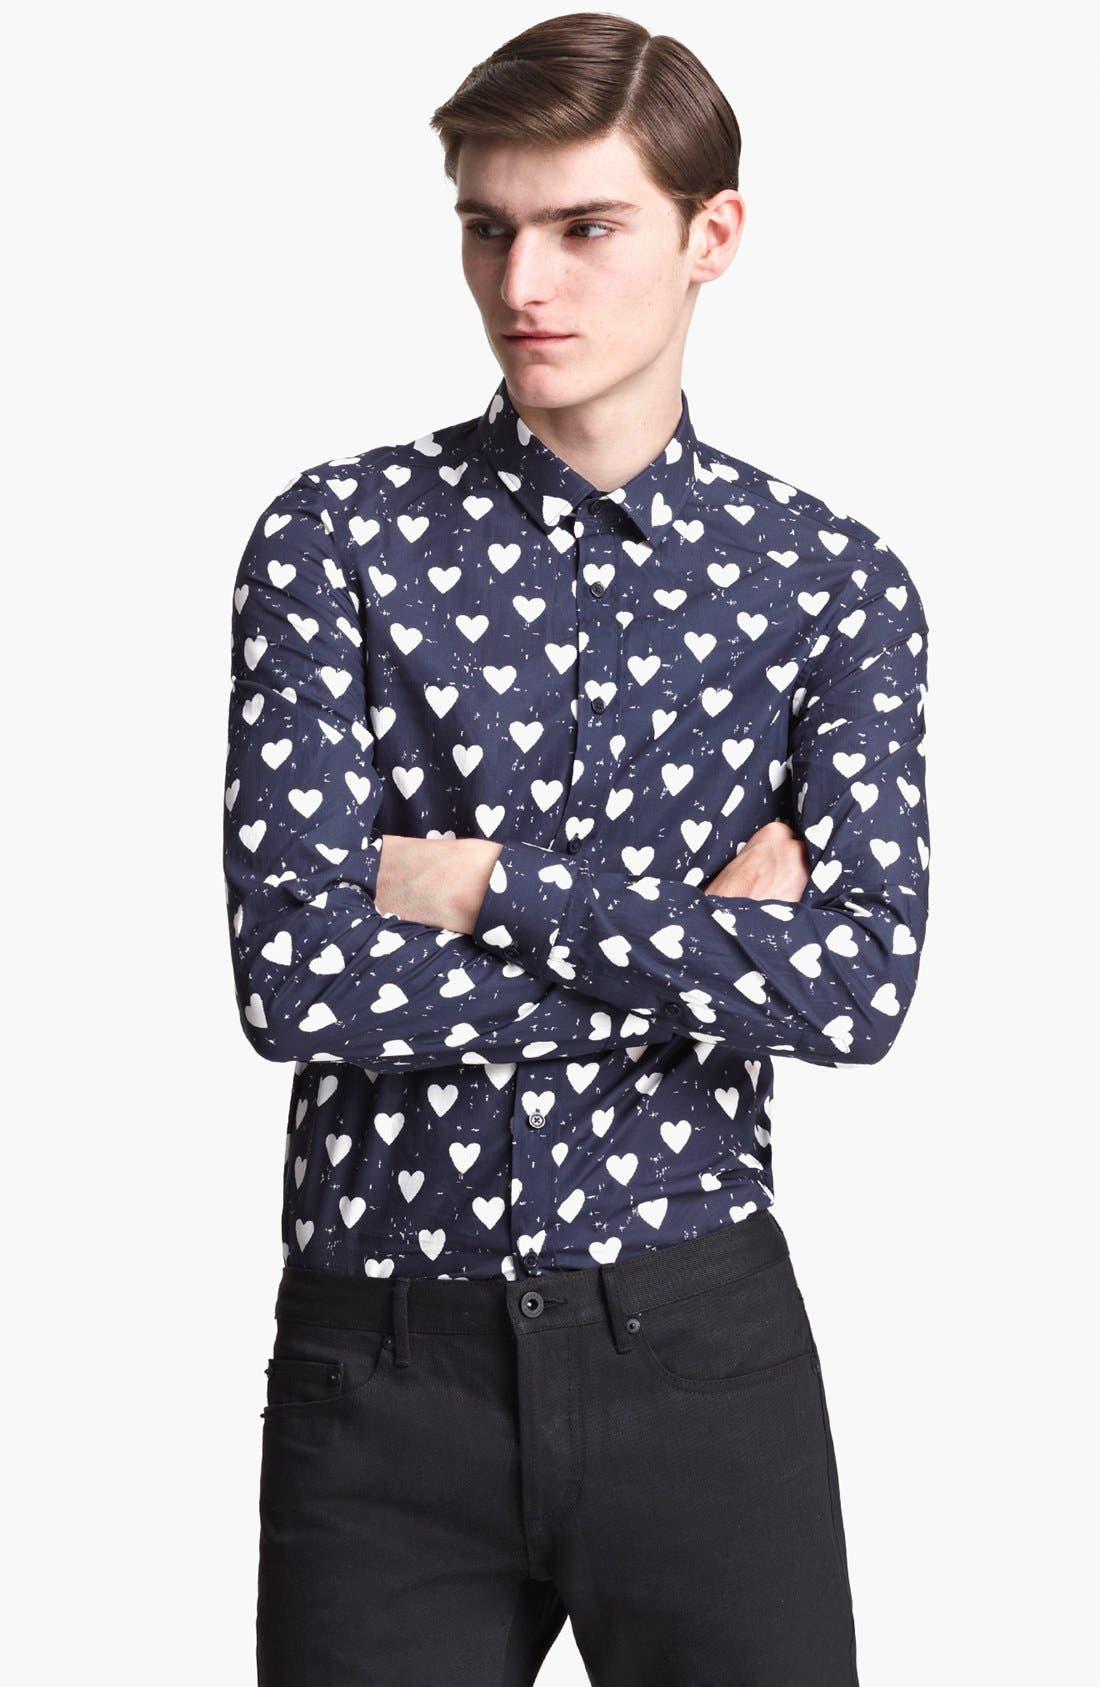 Alternate Image 1 Selected - Burberry Prorsum Heart Print Poplin Sport Shirt